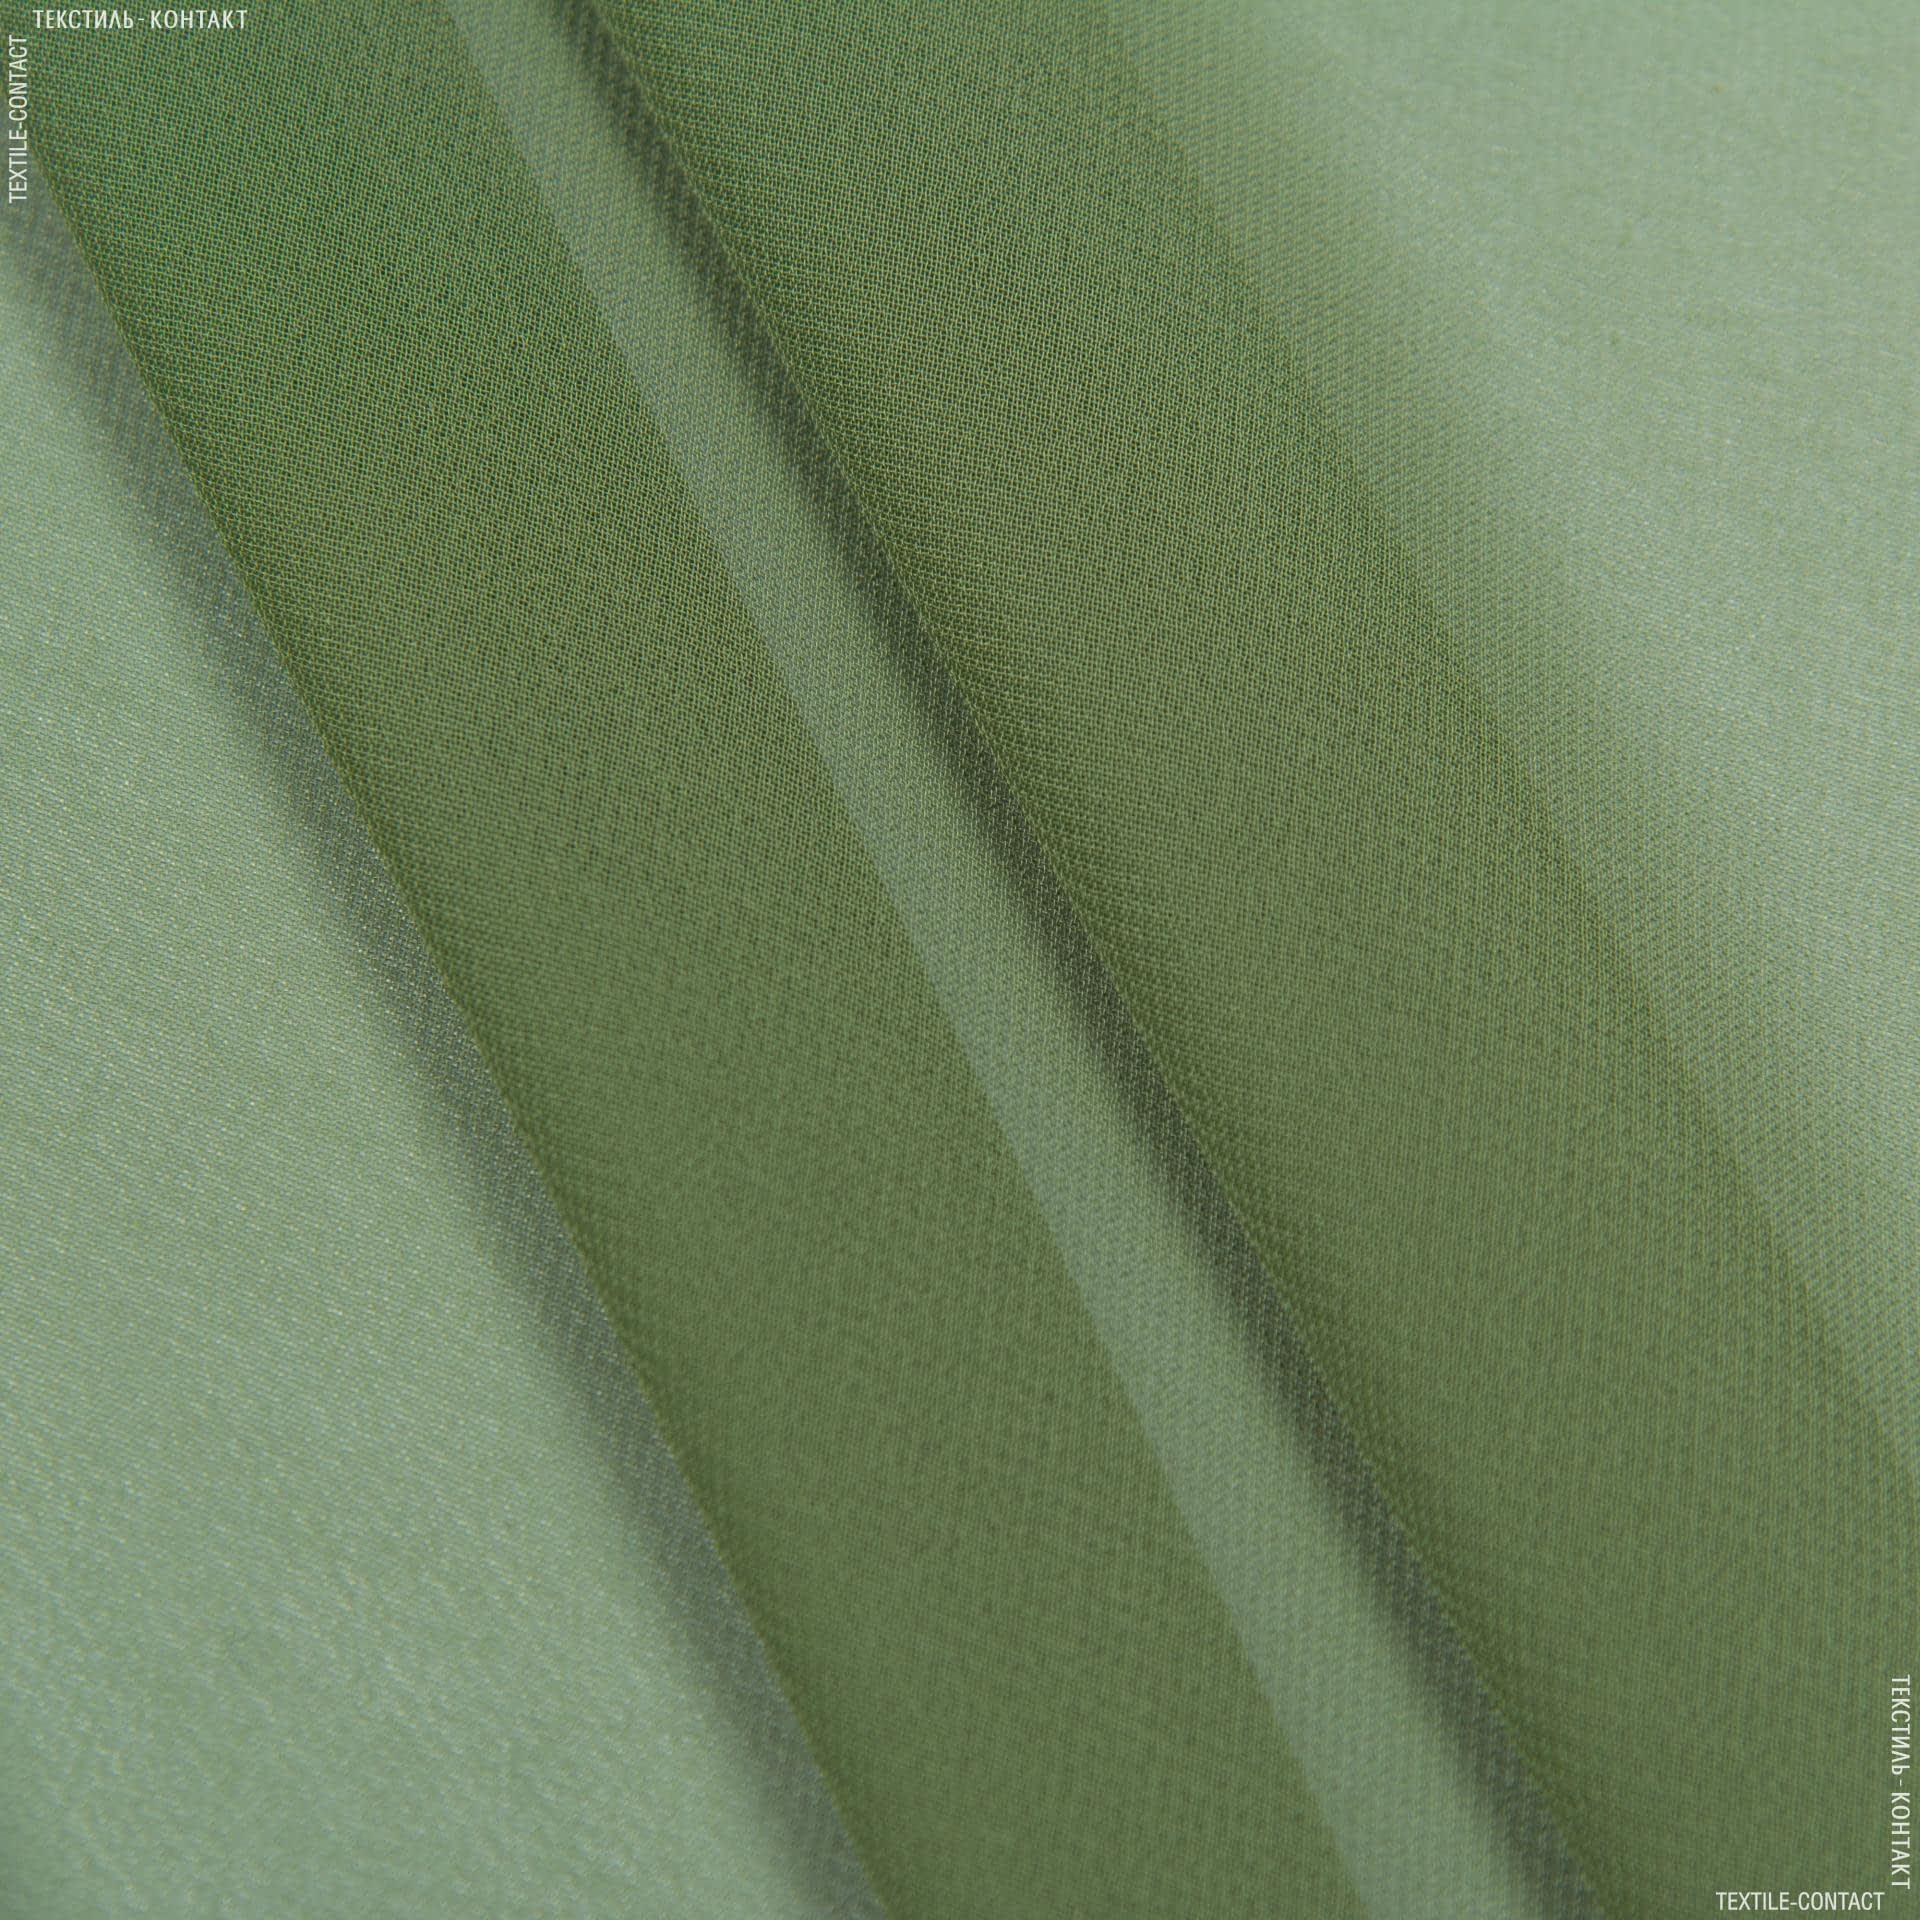 Ткани для платков и бандан - Шифон мульти темно-оливковый